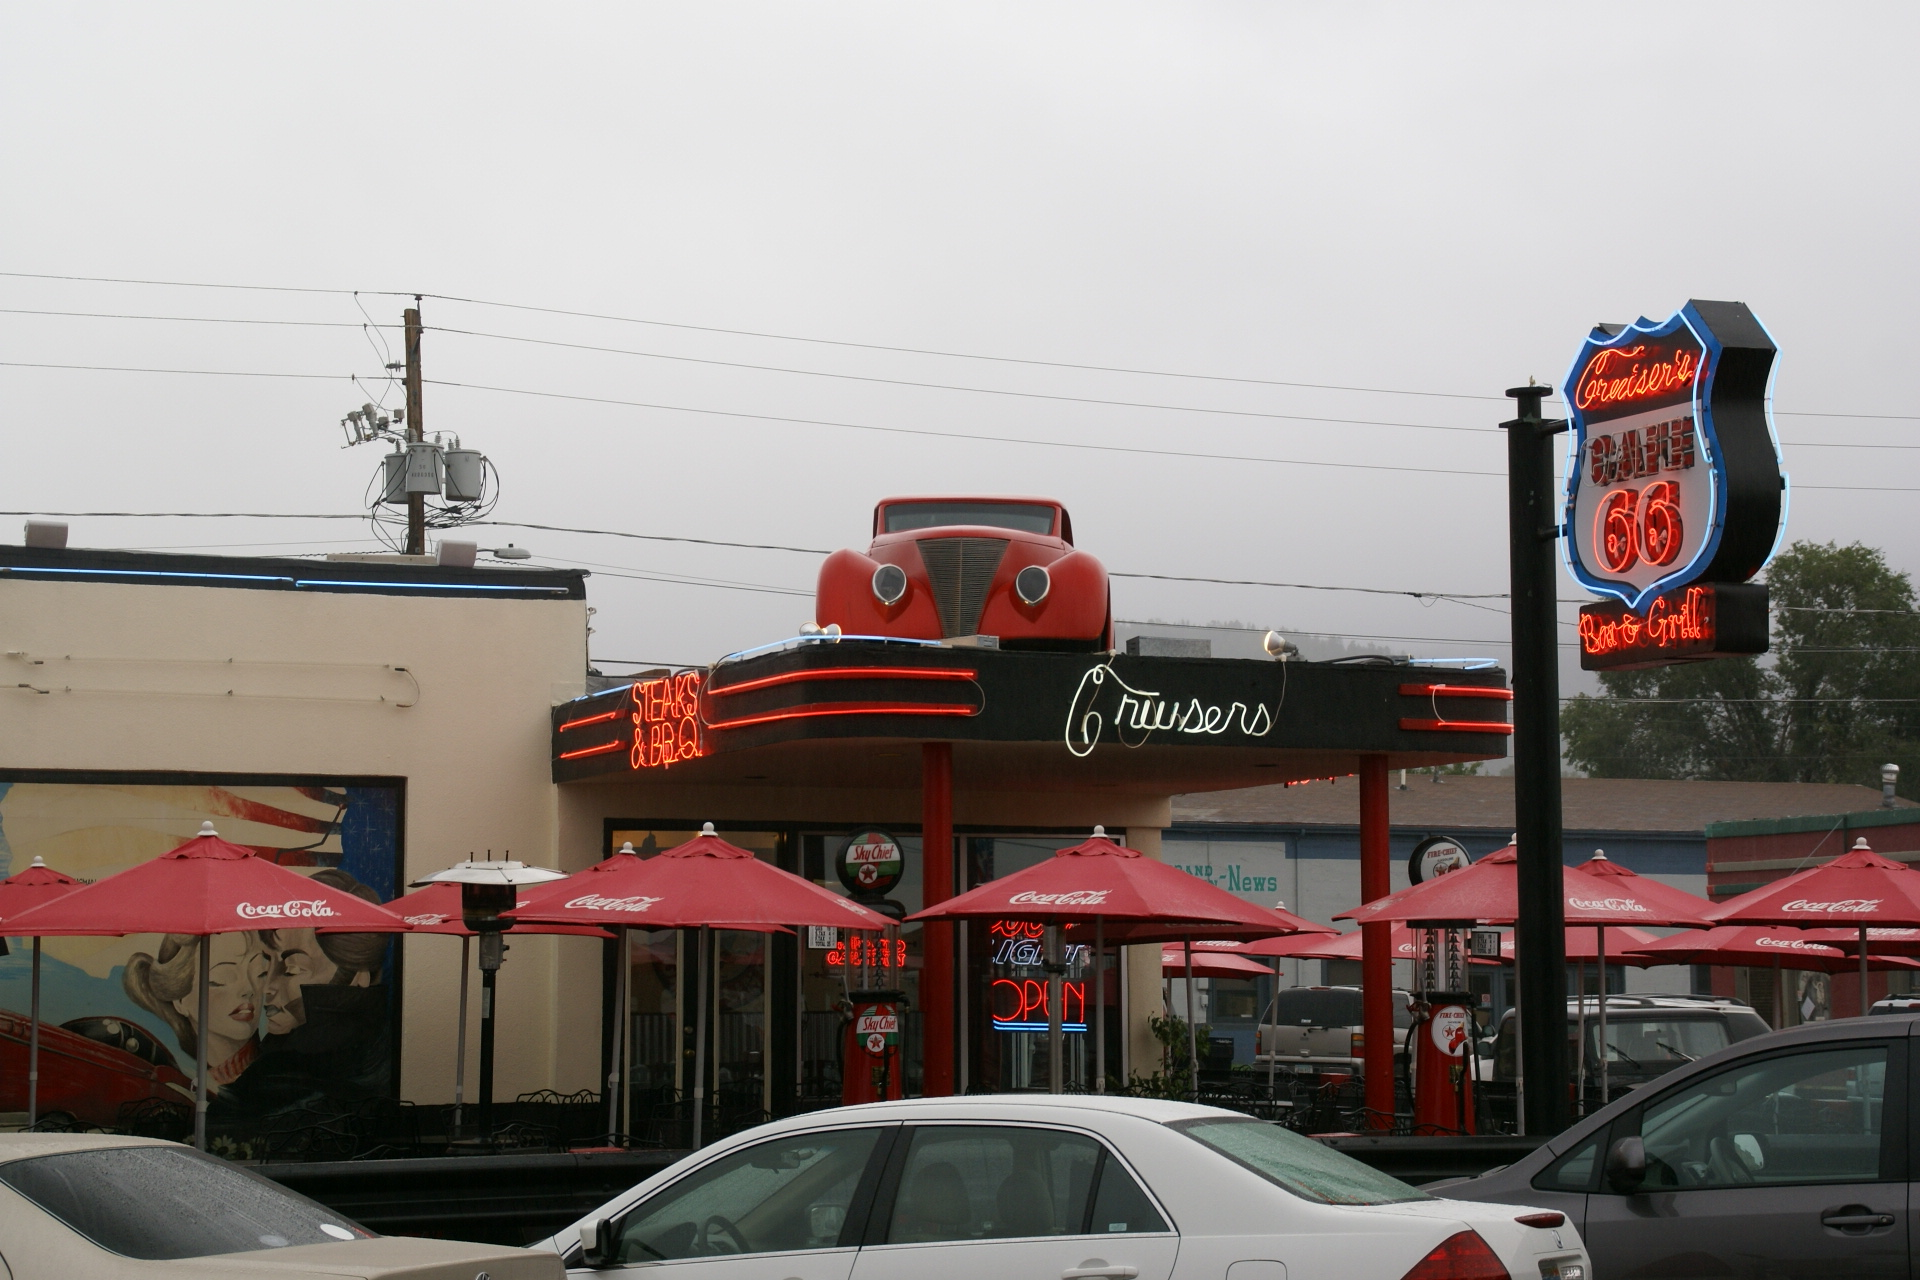 file:2012.09.11.173305 restaurant w route 66 williams arizona usa